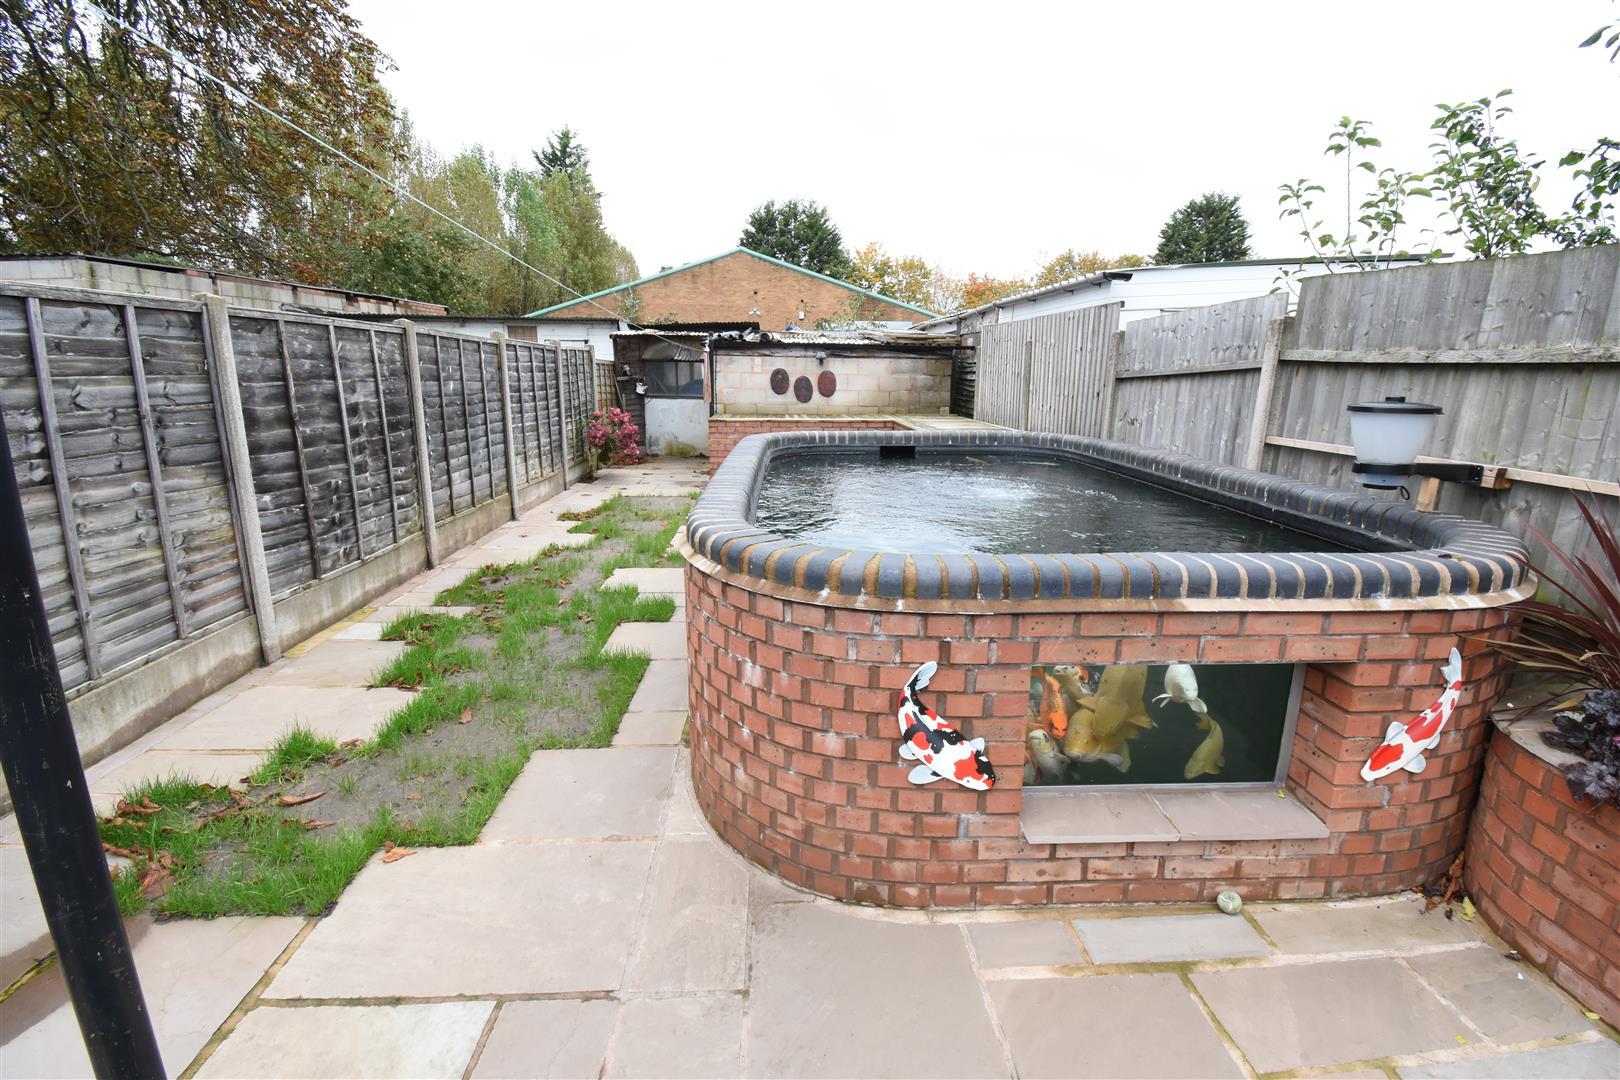 3 bed house for sale in Drews Lane, Birmingham B8 2SL 15